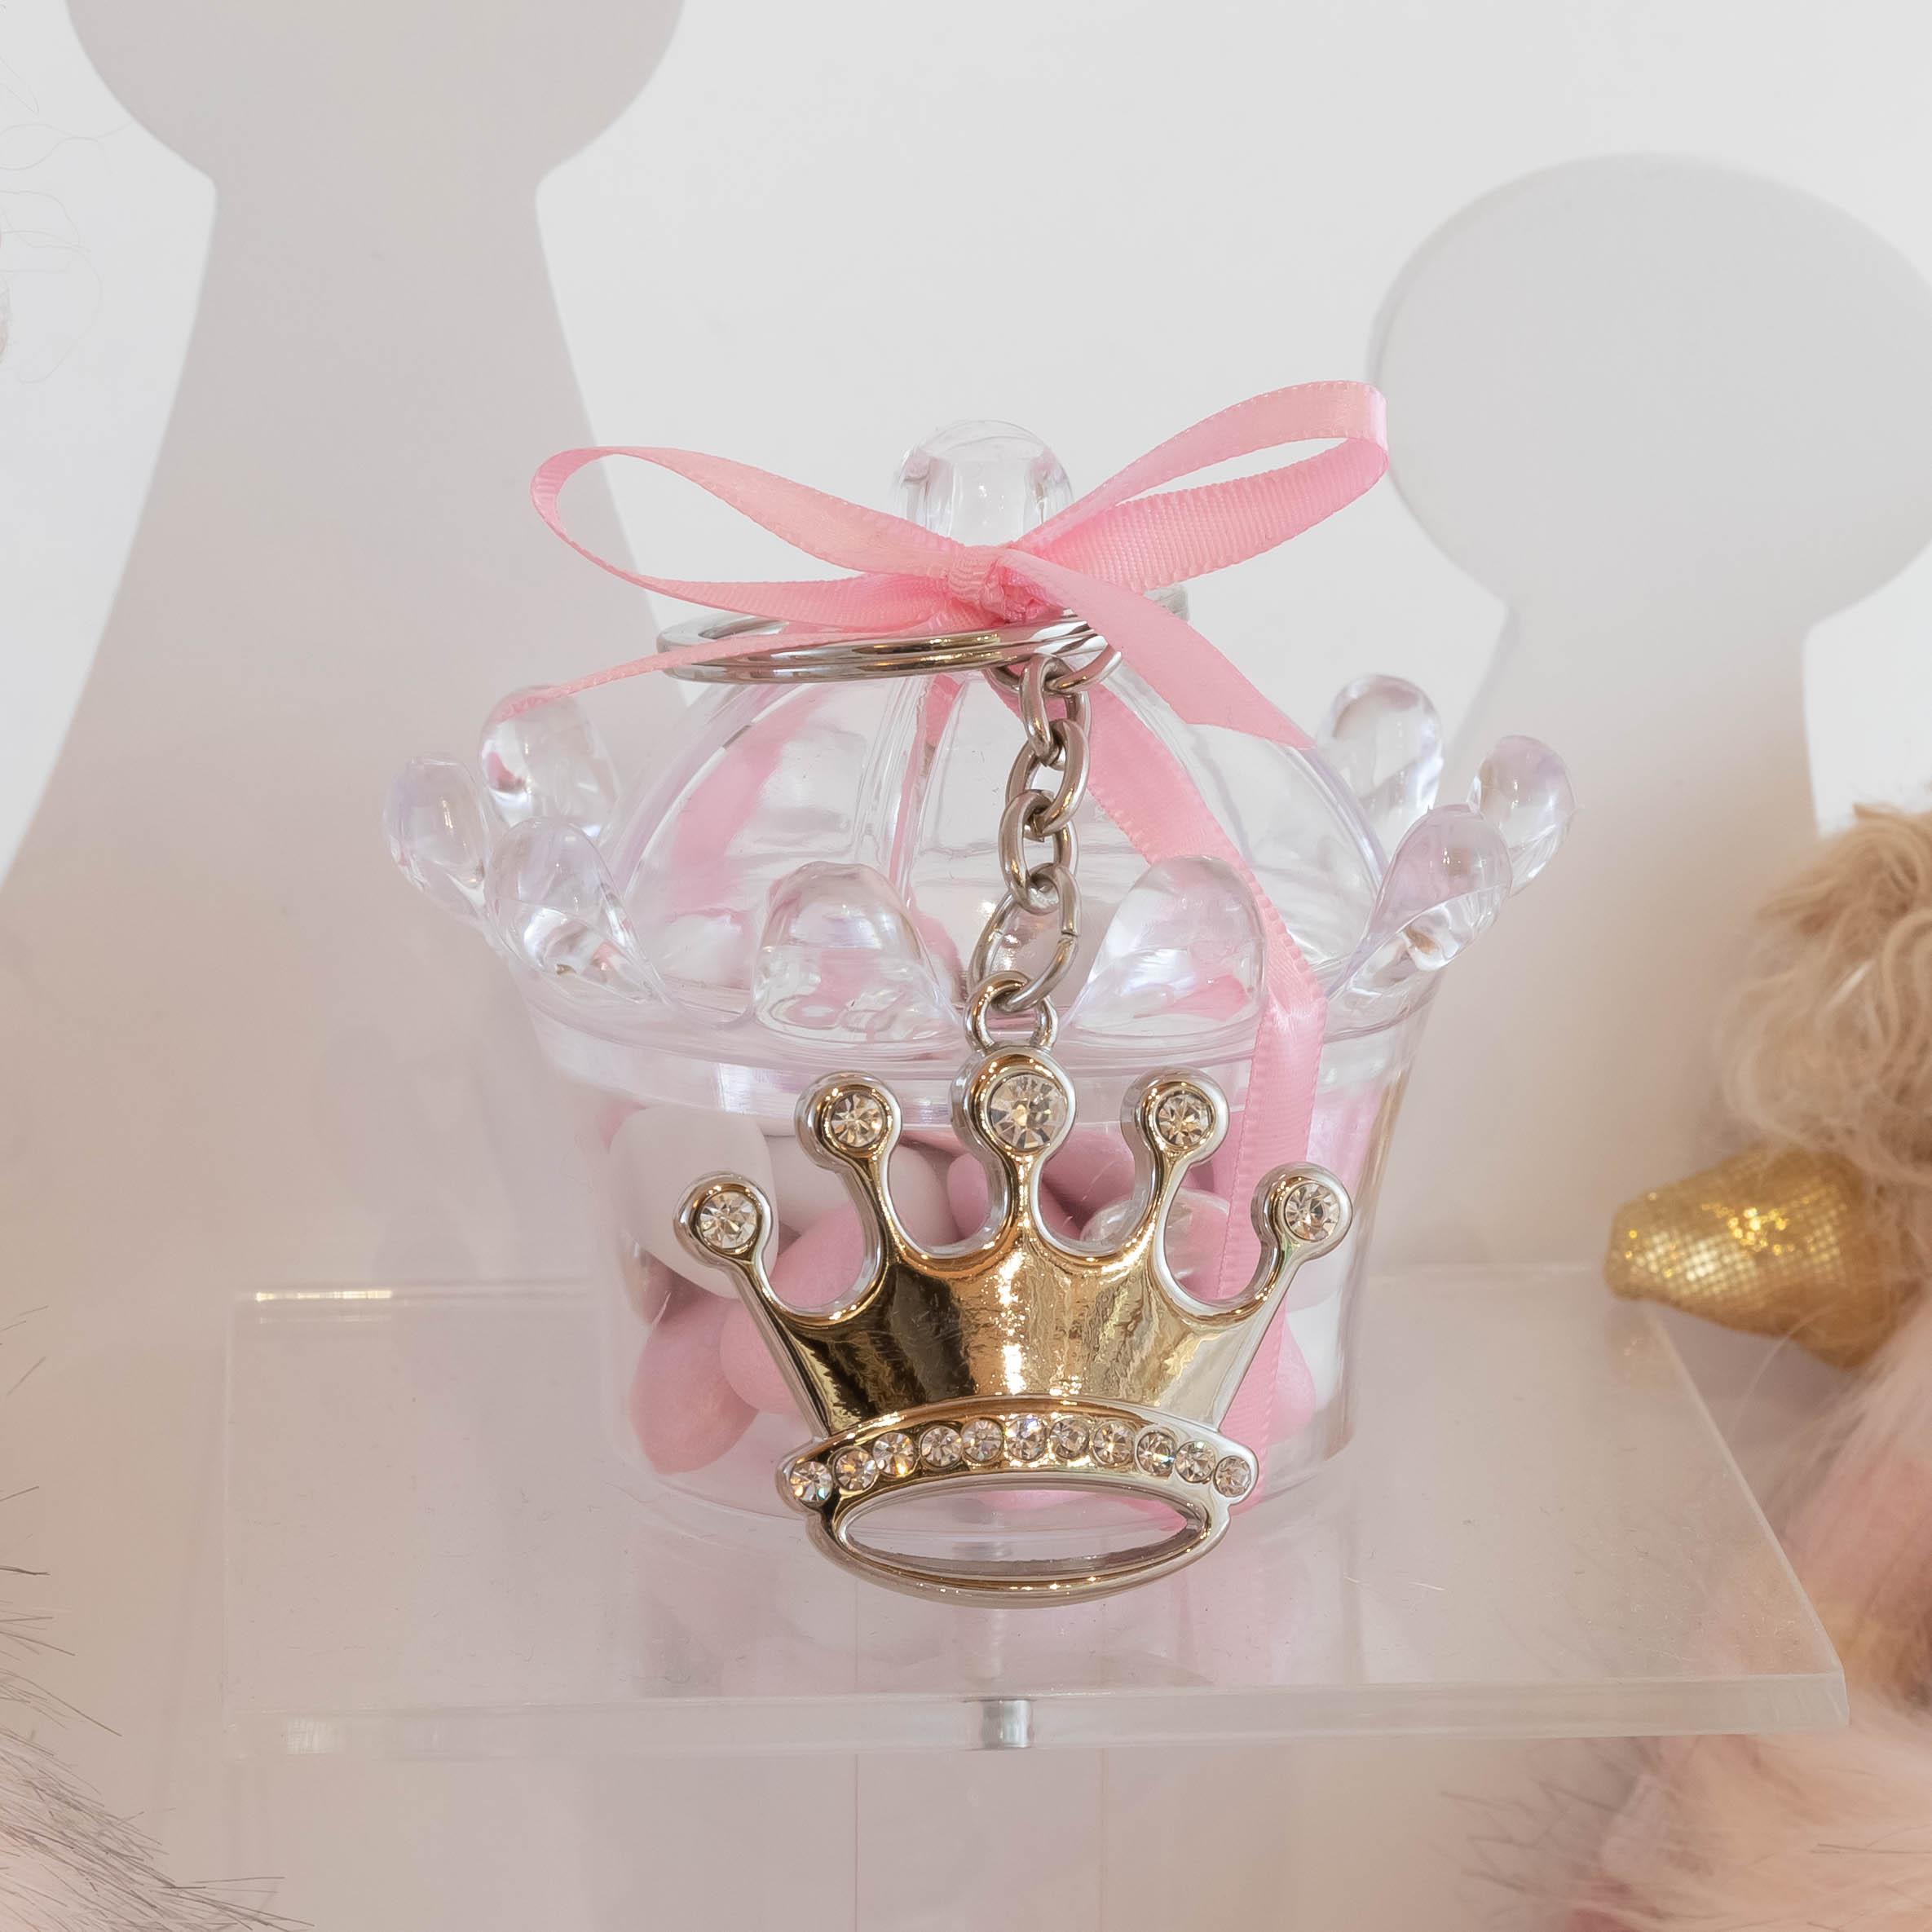 Boite couronne - Princesse Image